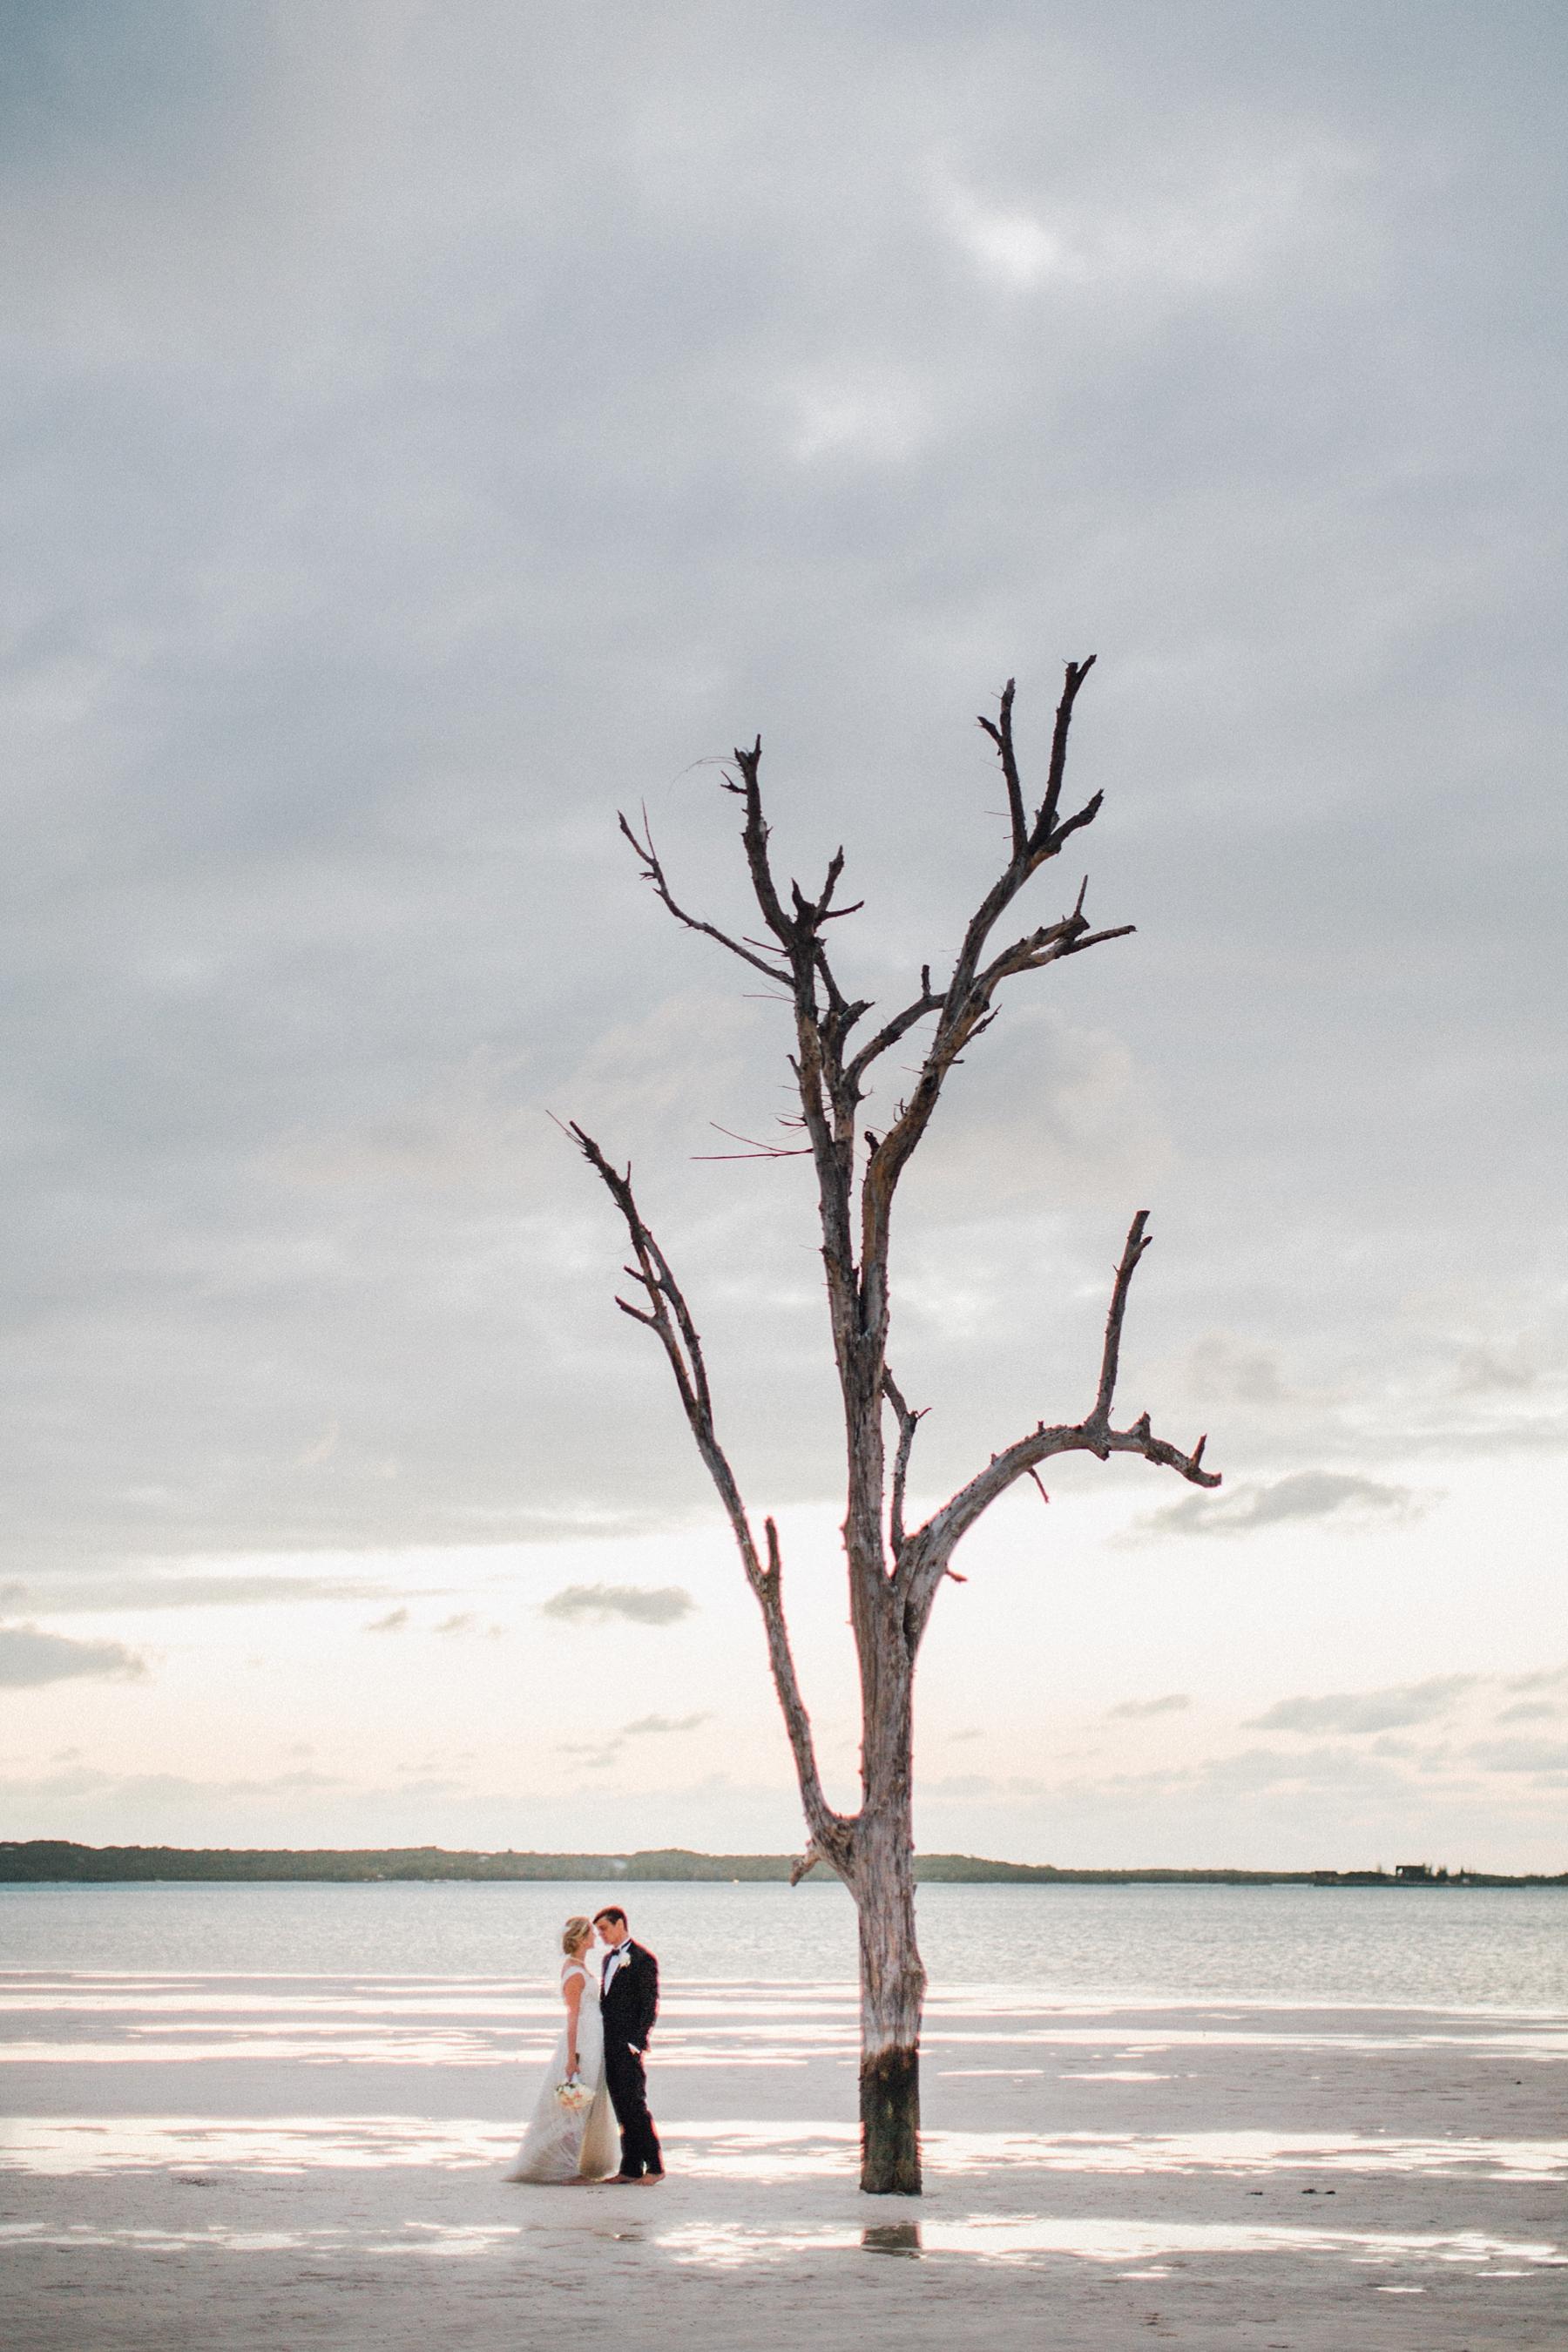 intimate-destination-wedding-beach-moments-harbour-island_0108.jpg